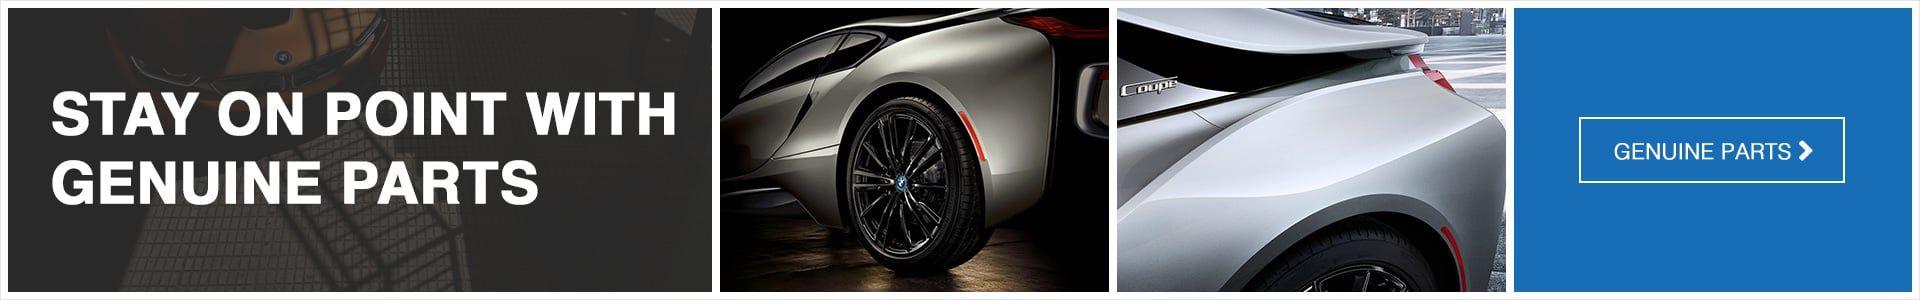 OEM BMW & Accessories